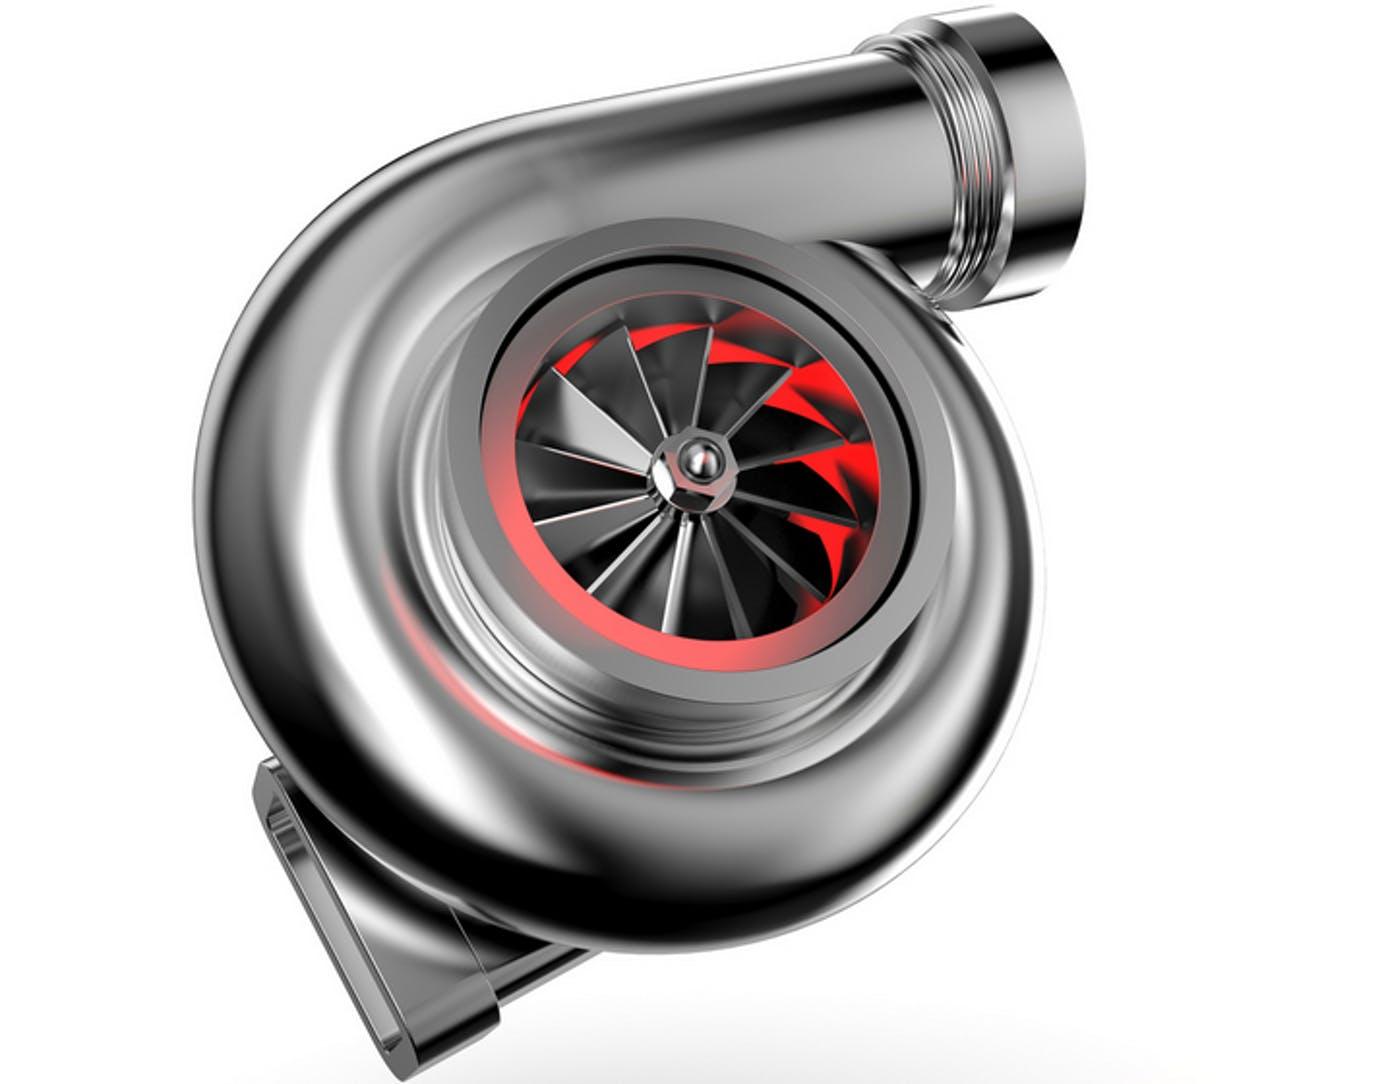 small resolution of turbo jpeg